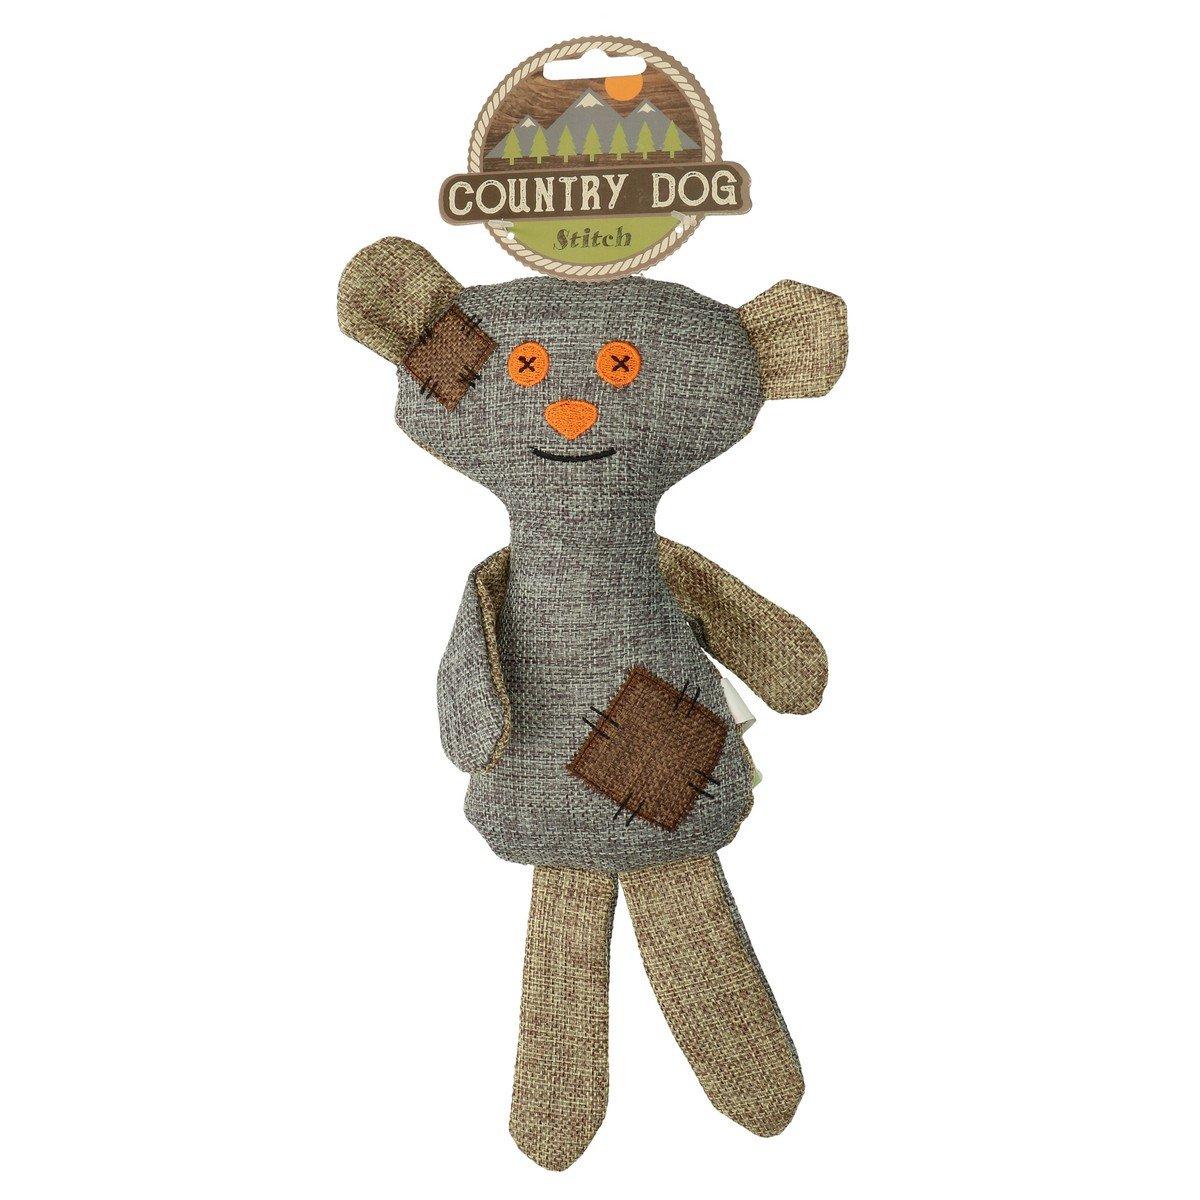 Afbeelding van Country Dog Stitch 1 St